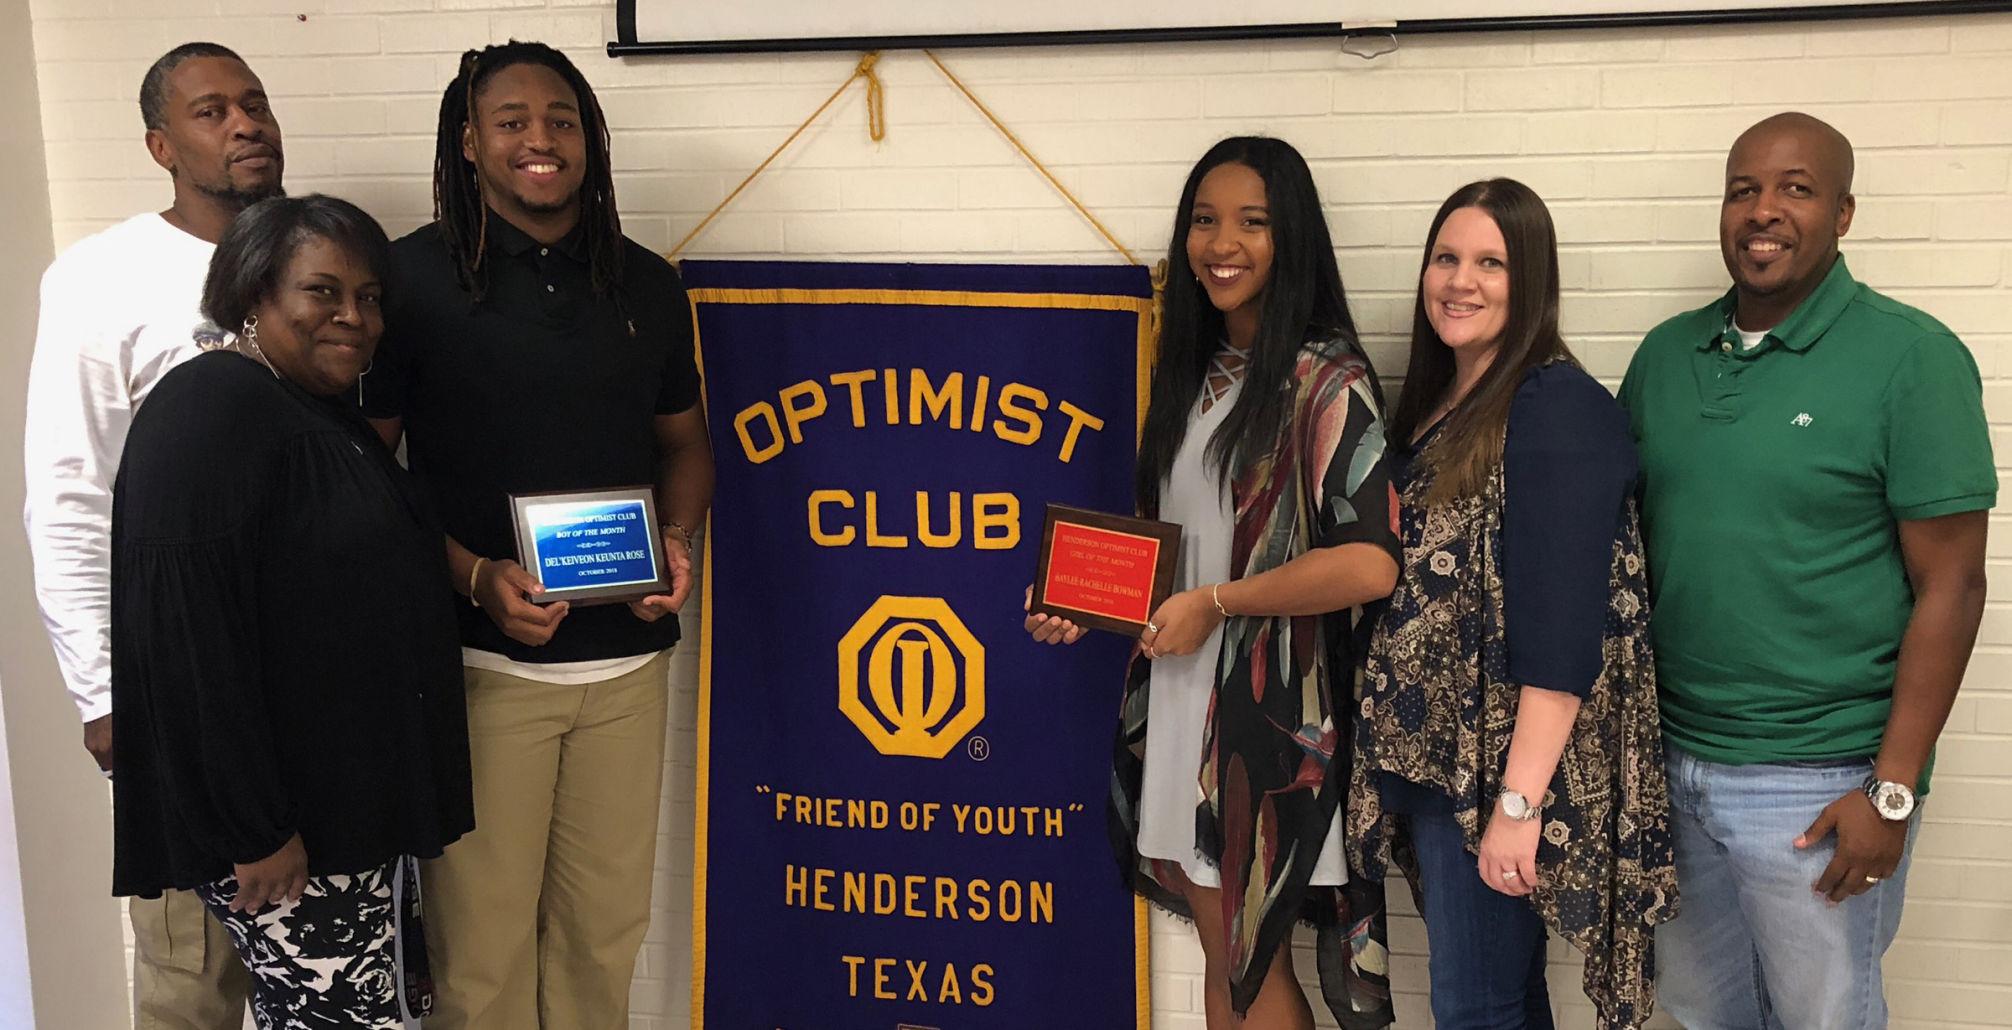 Bowman, Rose named Optimist Girl, Boy of the Month   Henderson Daily News